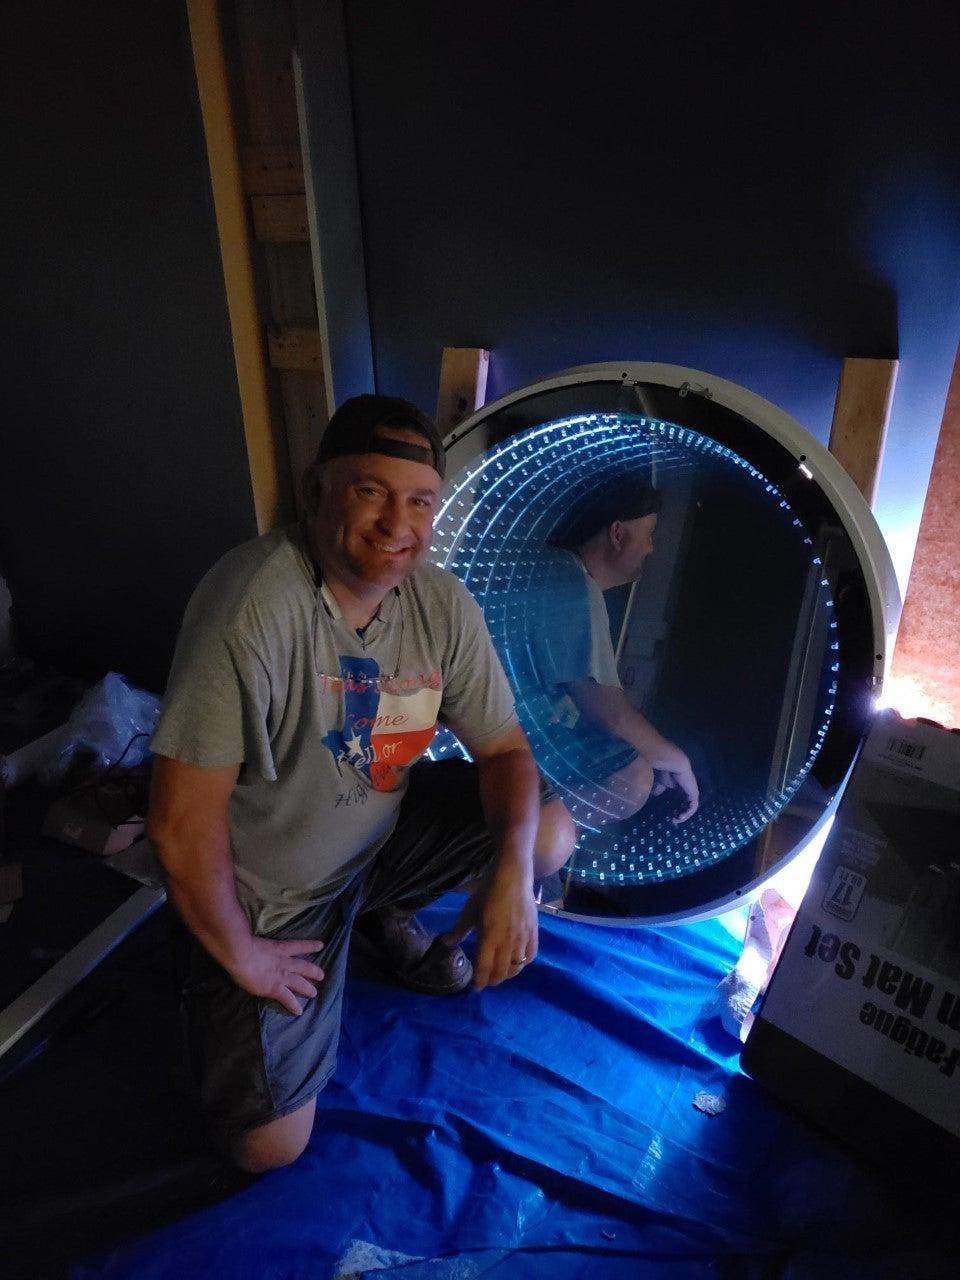 Built Vortex Exhaust Intake Manifold. (Huge Infinity Mirror)